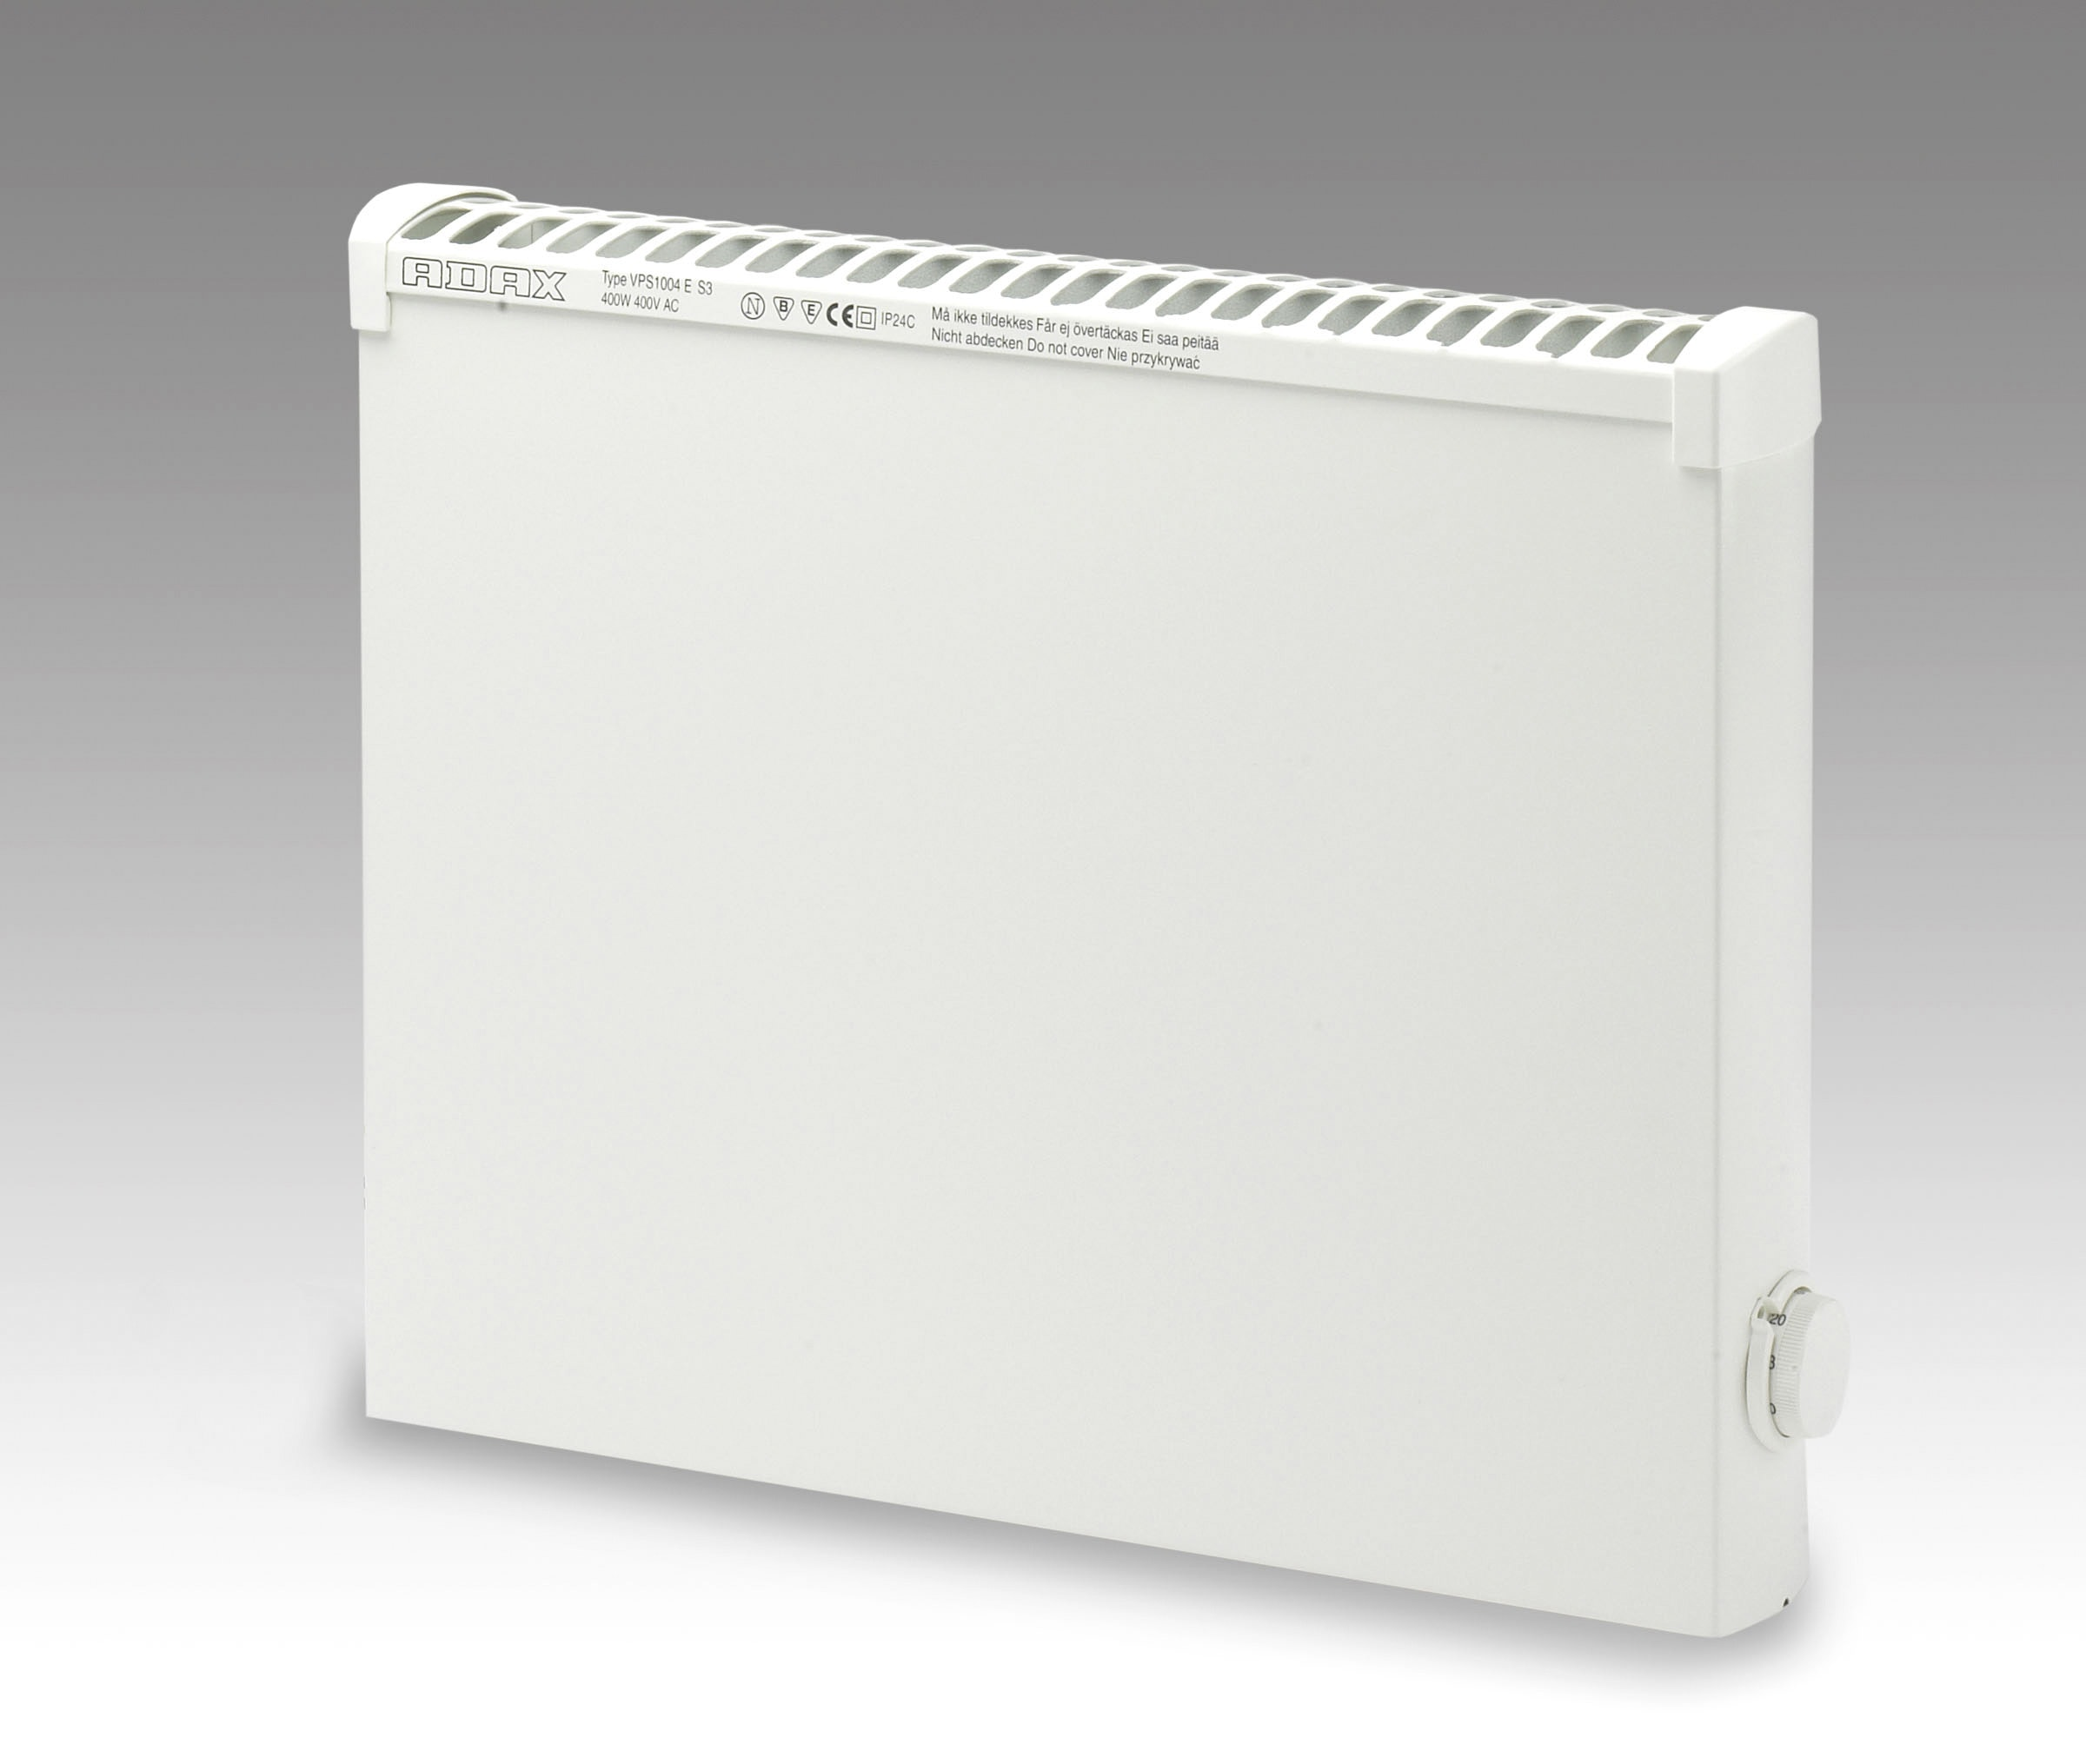 Våtrumselement Adax 782210 400W VPS1004/230V